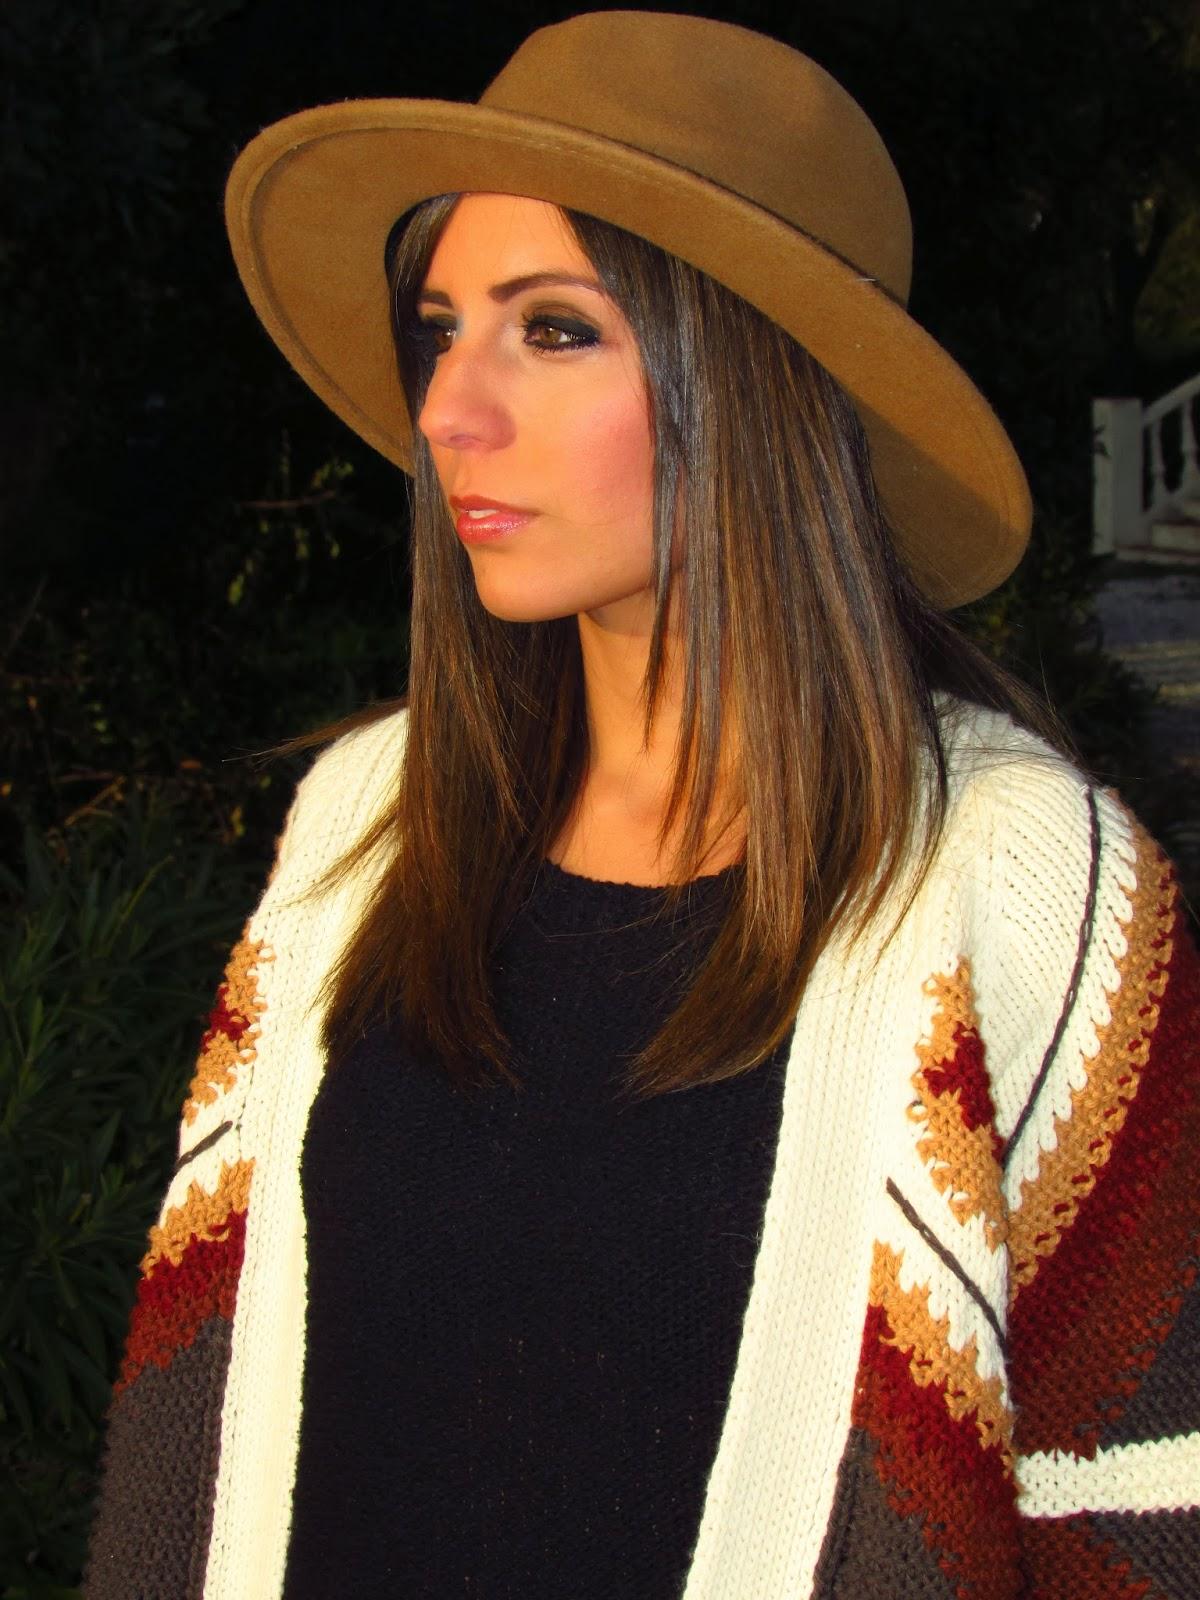 cristina style street style fashion fashion blogger blogger malaga malagueña boho chic tendencias moda outfit look inspiration ootd